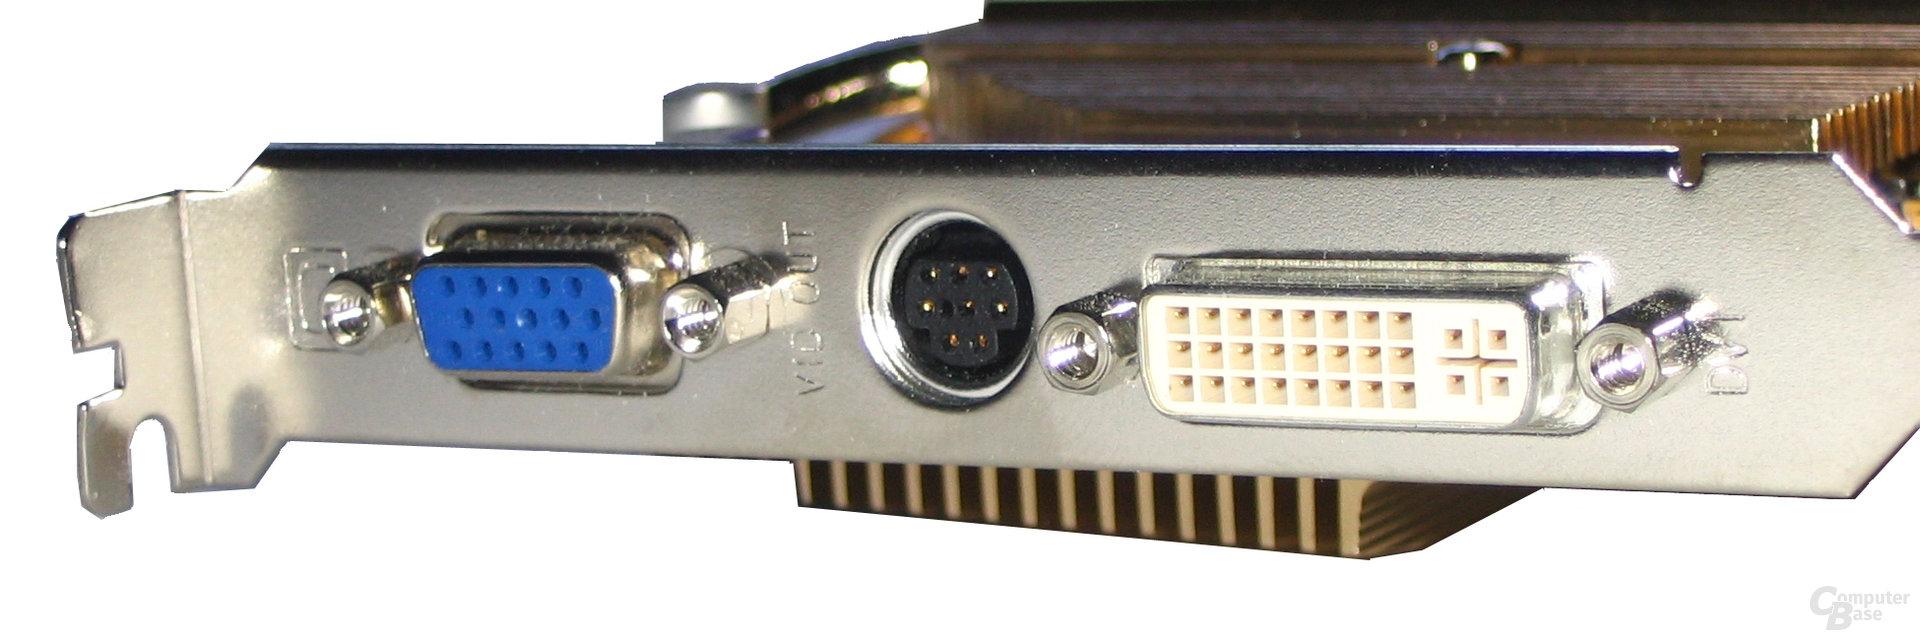 Gigabyte Radeon X800 XL Front-Panel